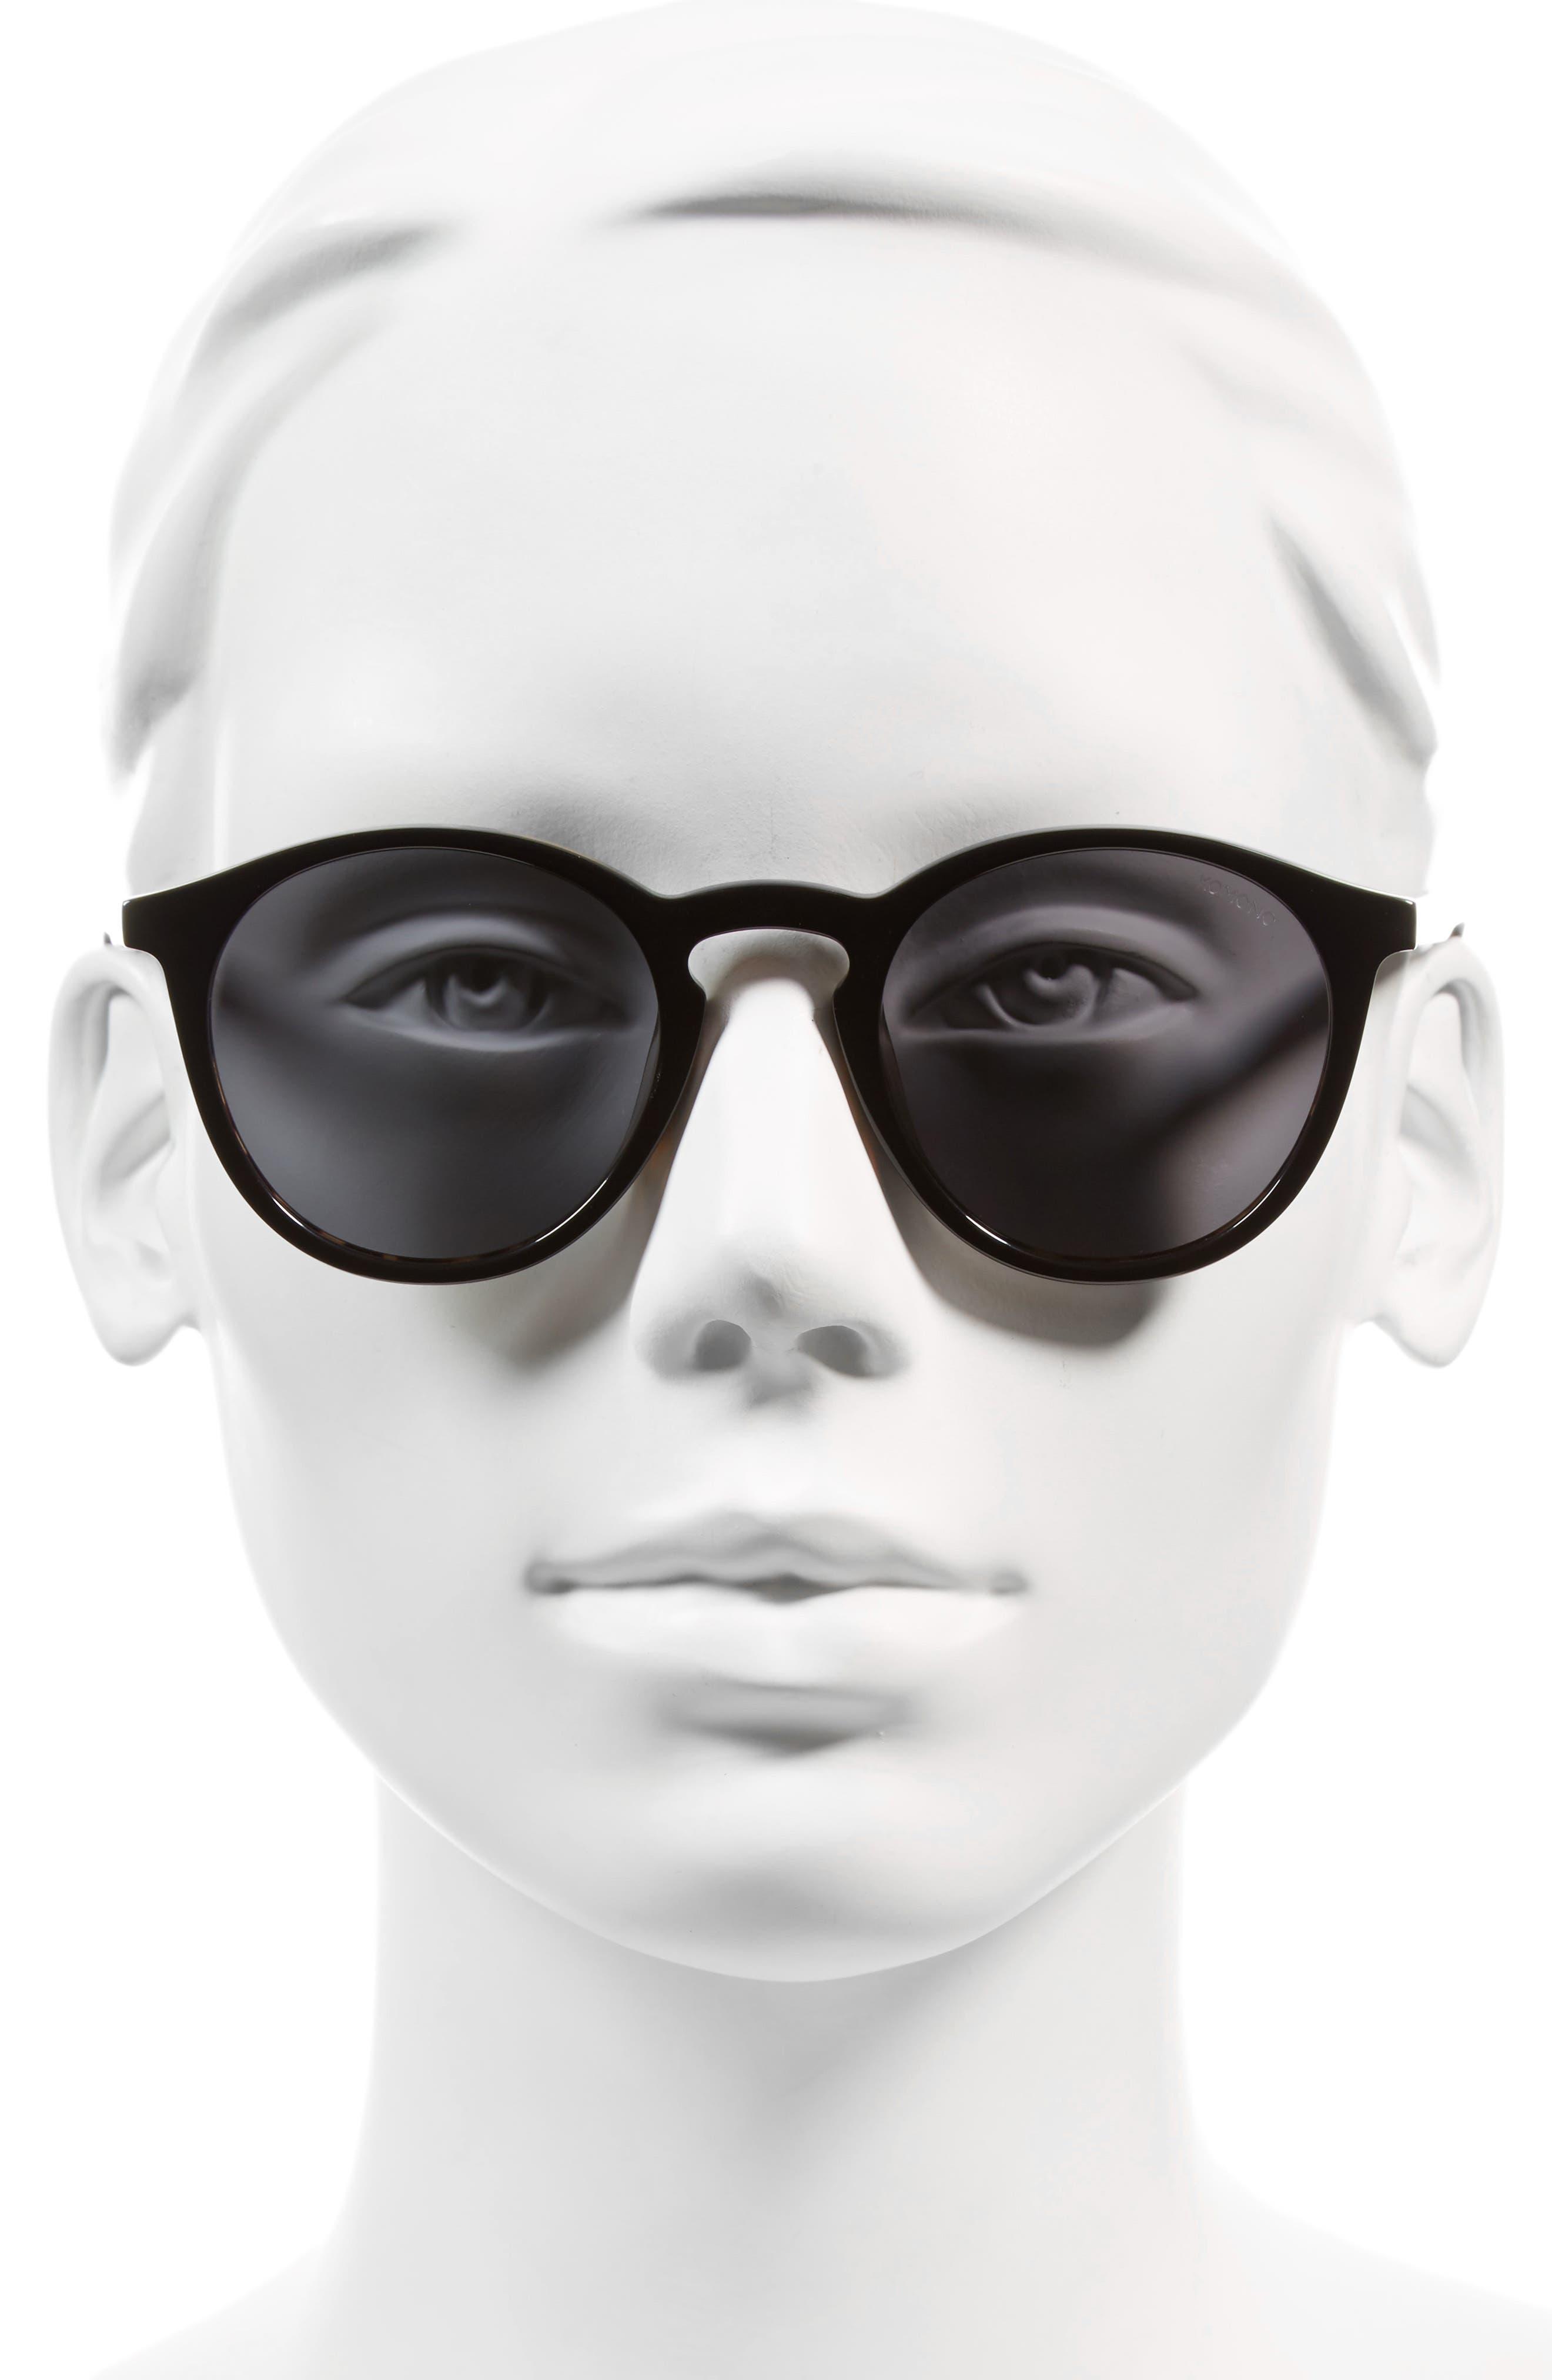 Aston 48mm Round Sunglasses,                             Alternate thumbnail 3, color,                             001